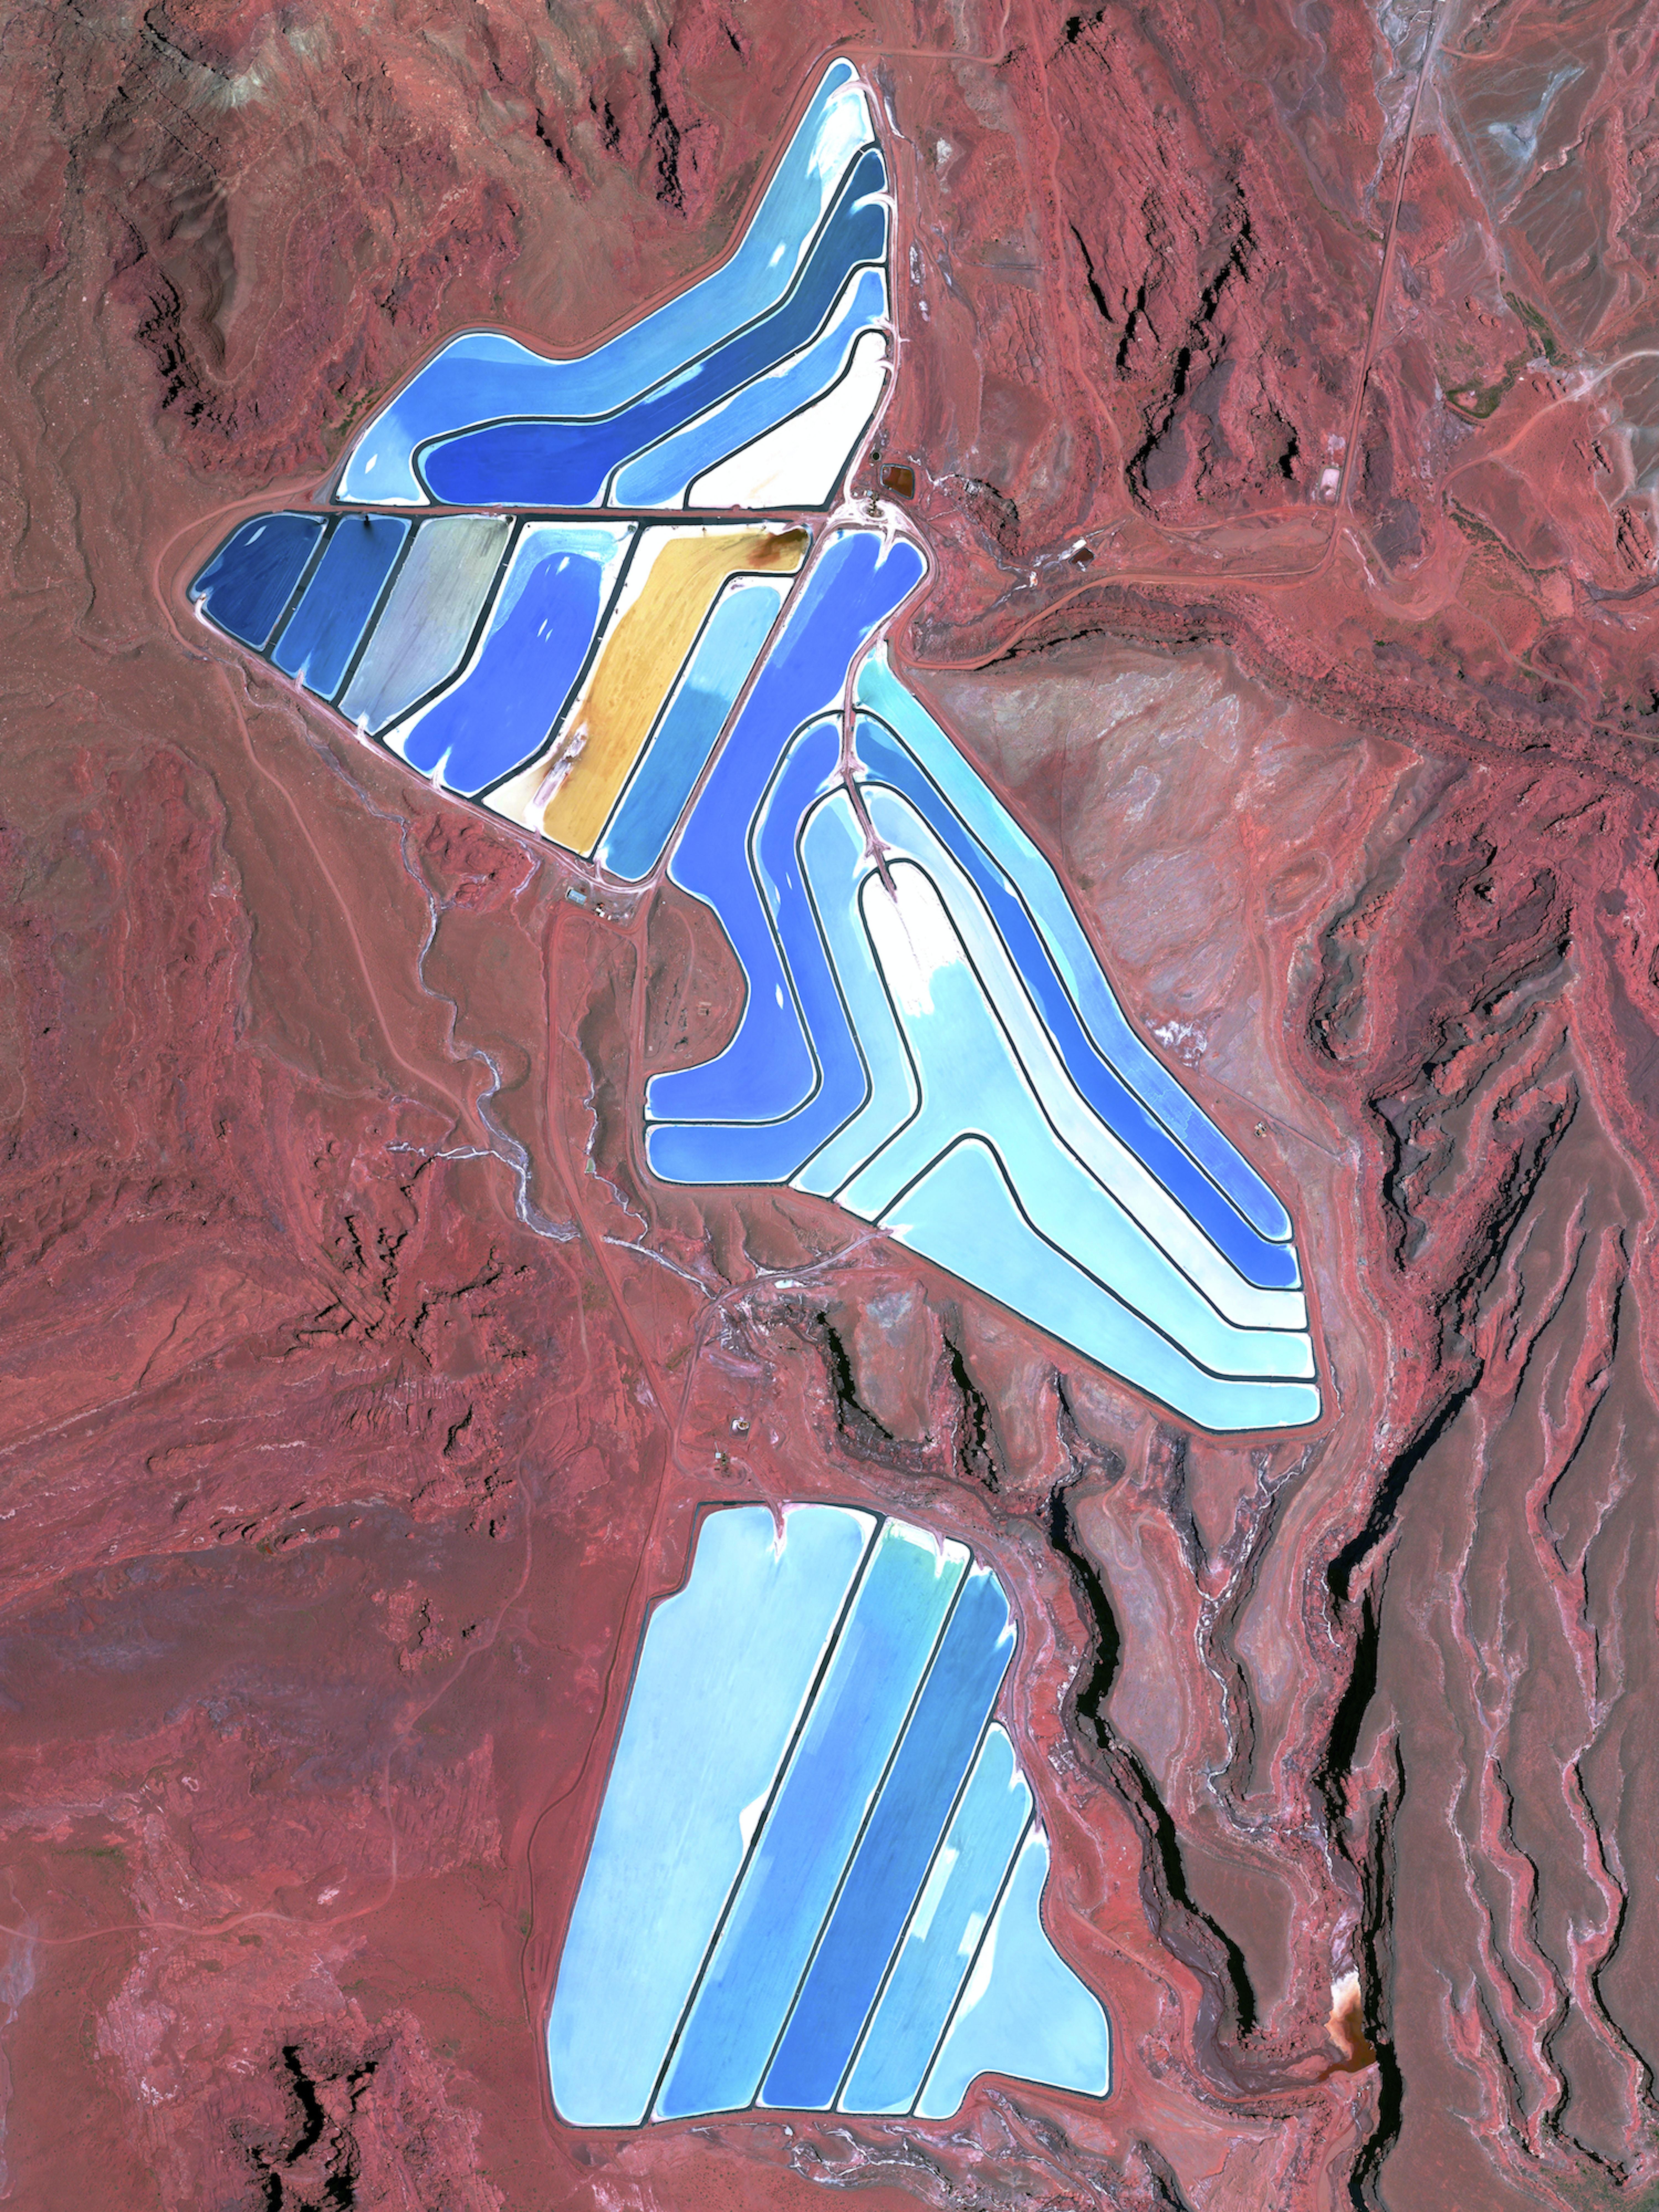 Moab Potash Evaportation Ponds